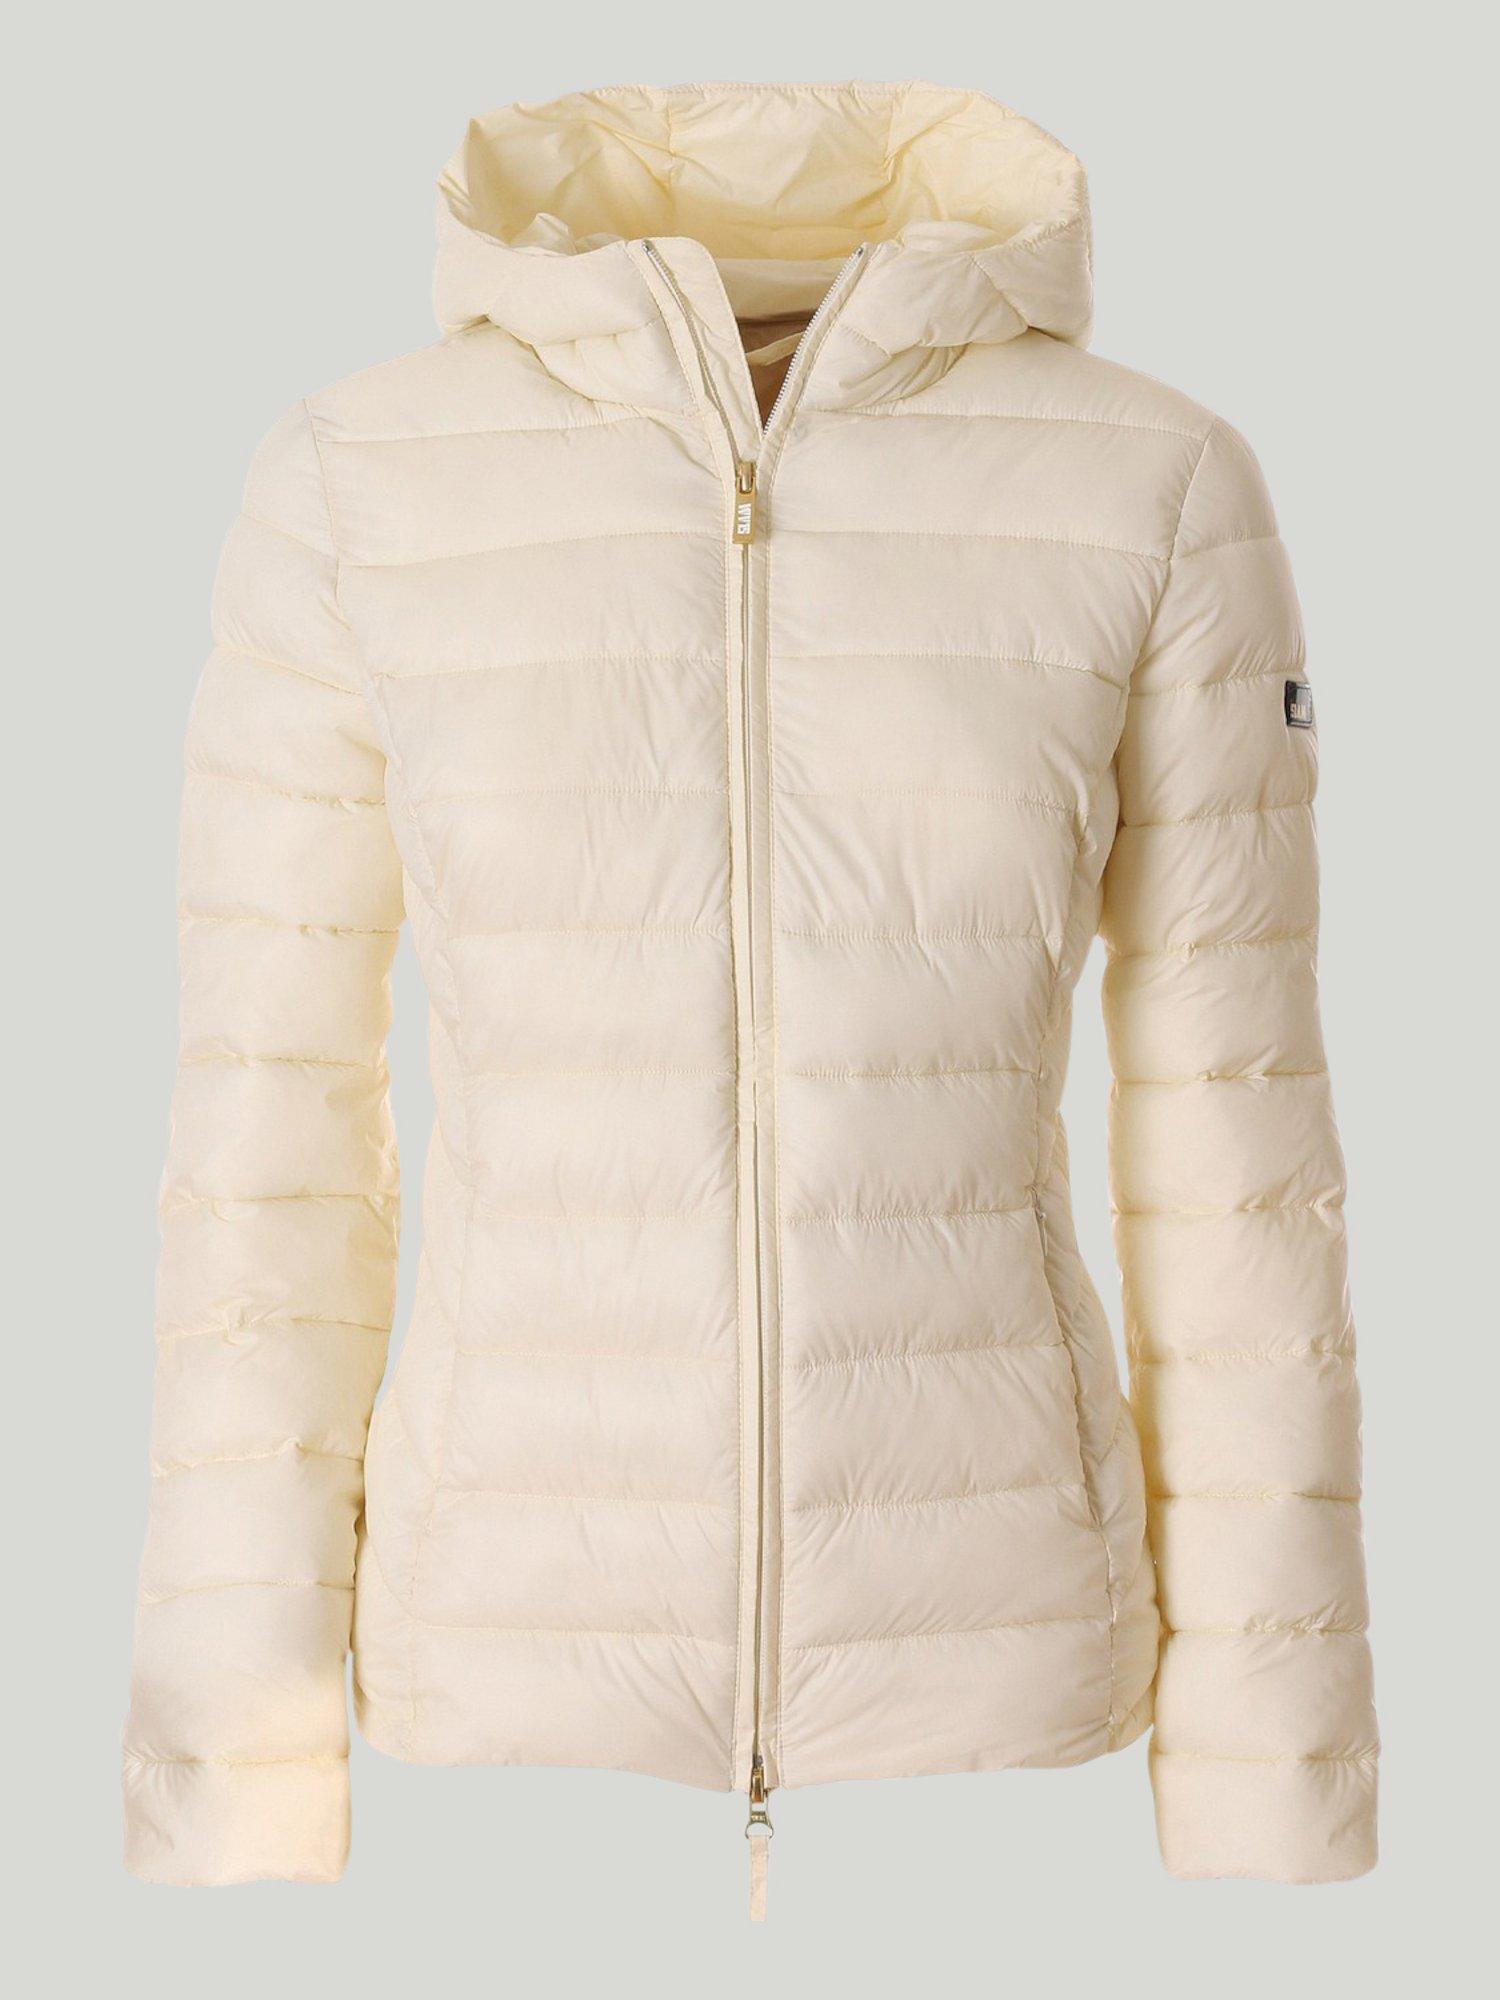 Tarigo jacket - Ivory